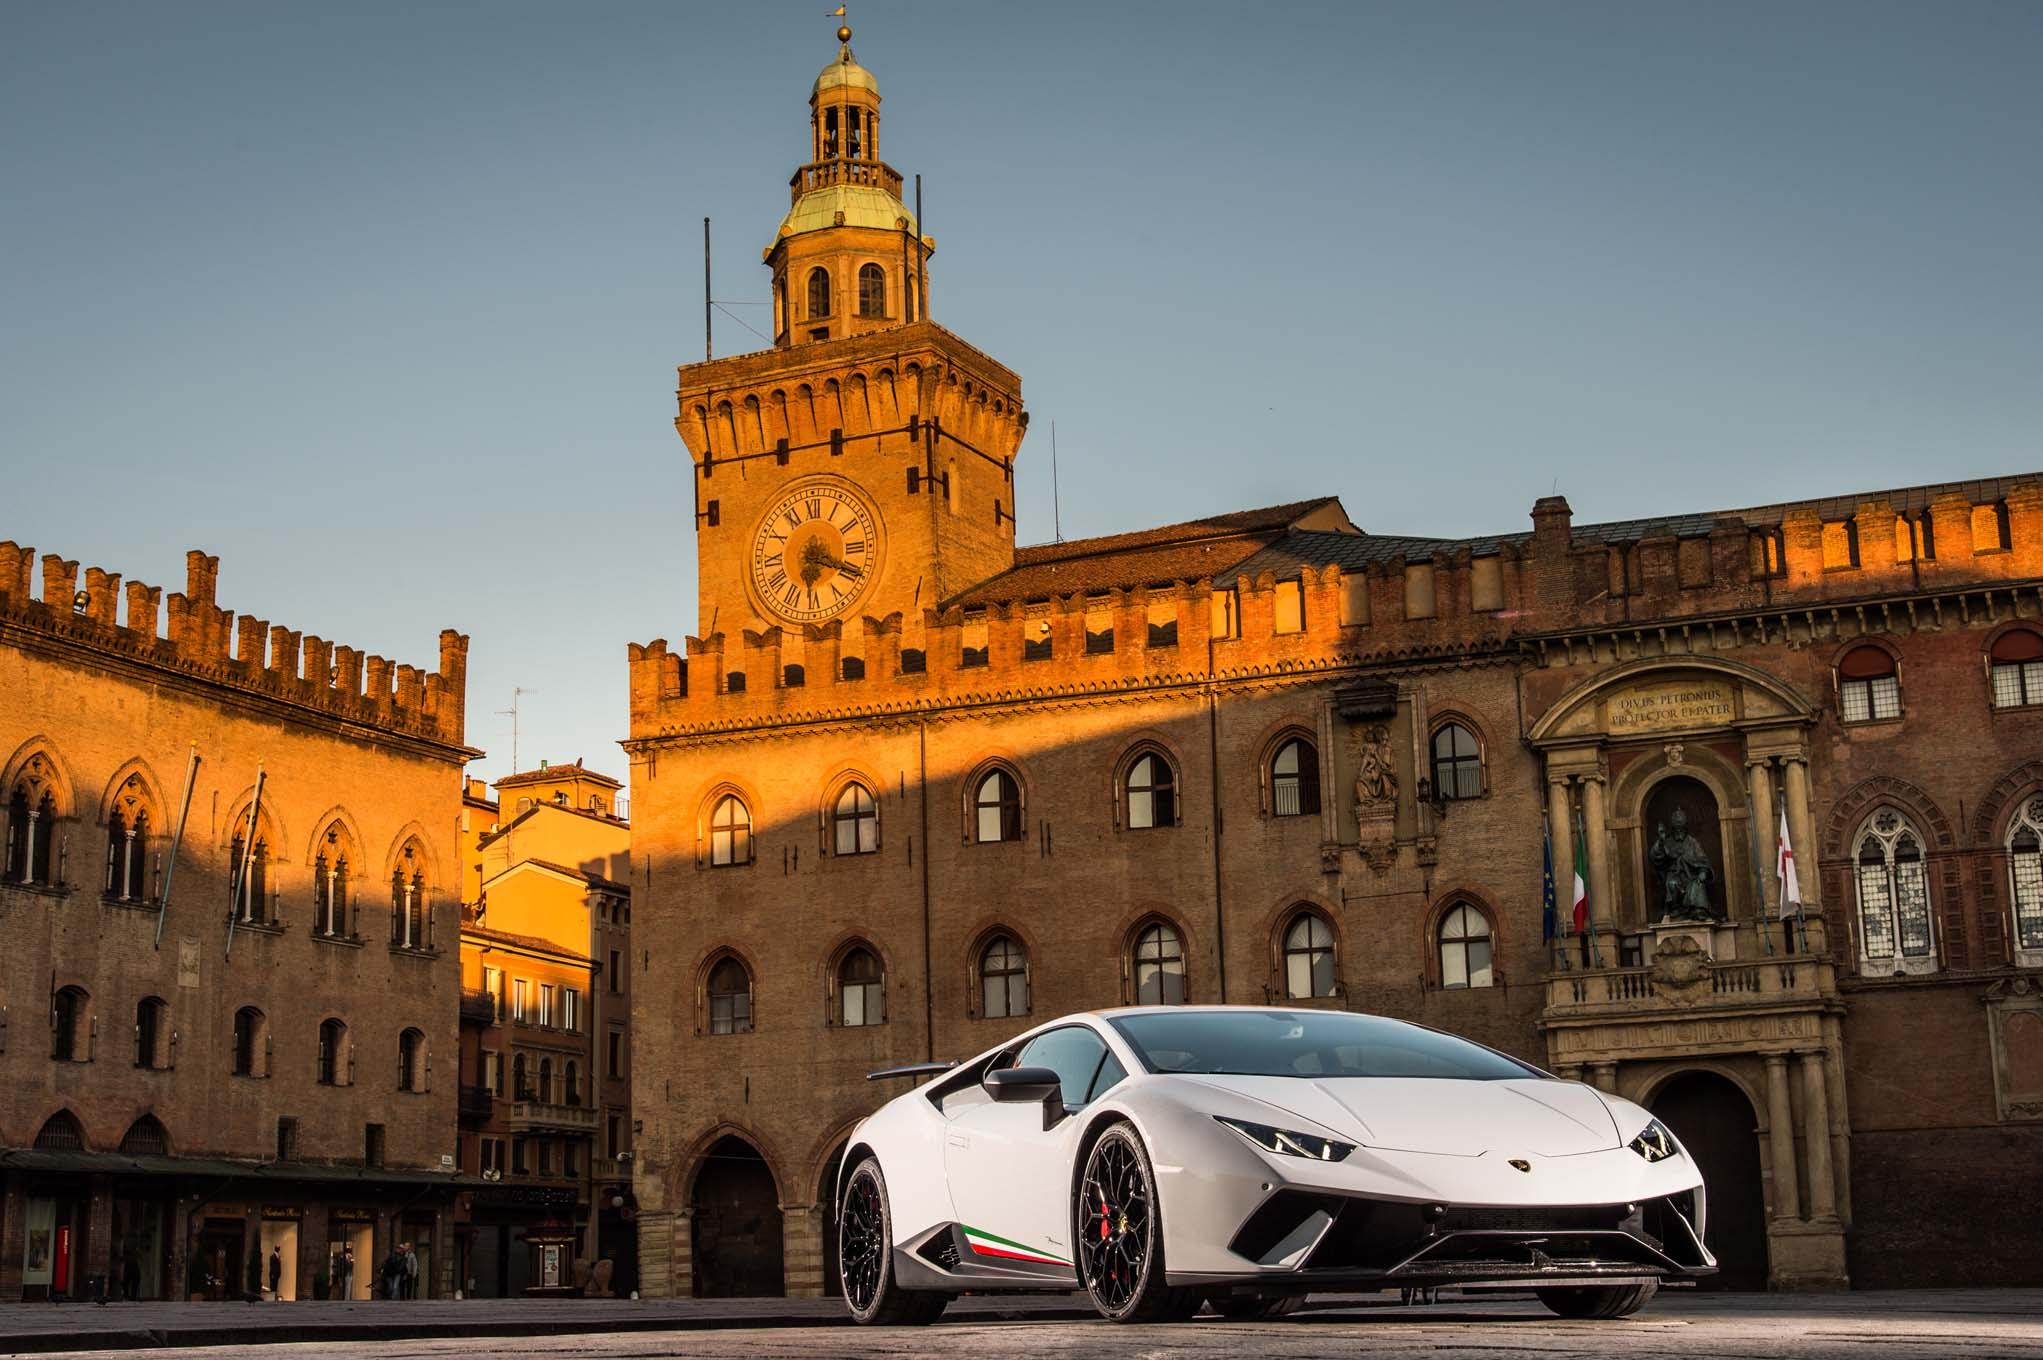 2018 Lamborghini Huracan Performante First Drive Review | Automobile